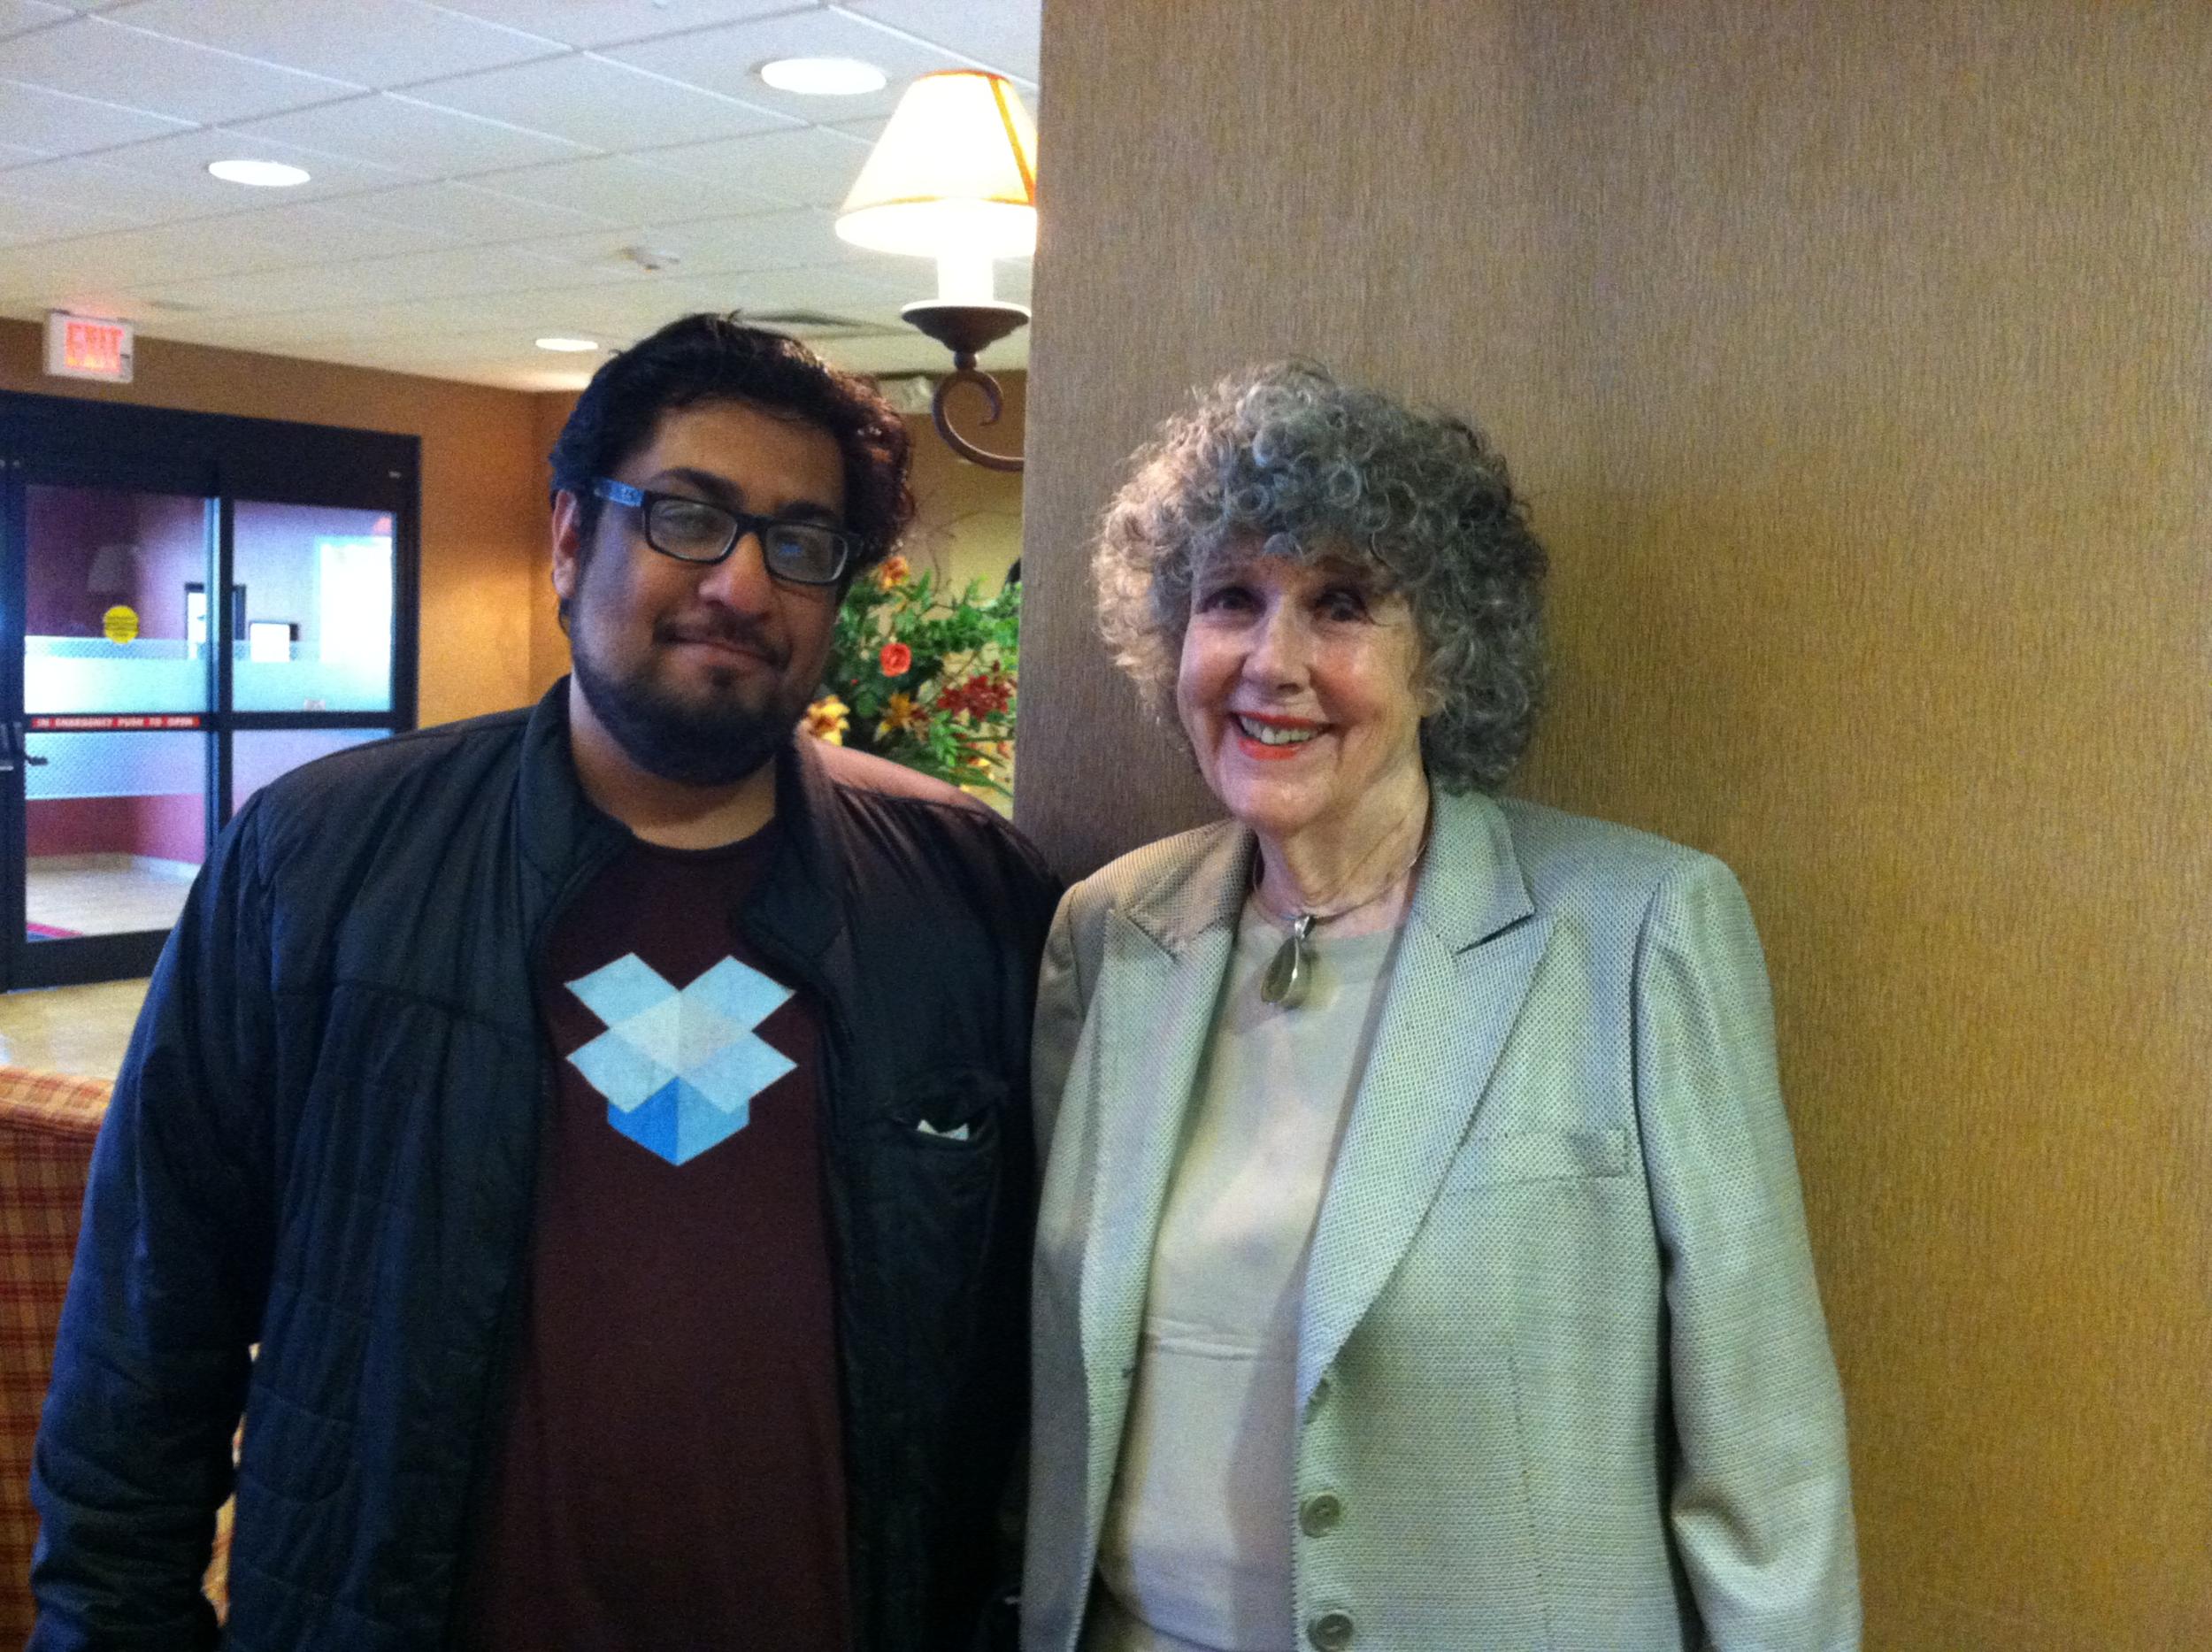 FAZLI AZEEM with Autism advocate Eustacia Cutler, mother of Autism self-advocate Dr. Temple Grandin. (2014)